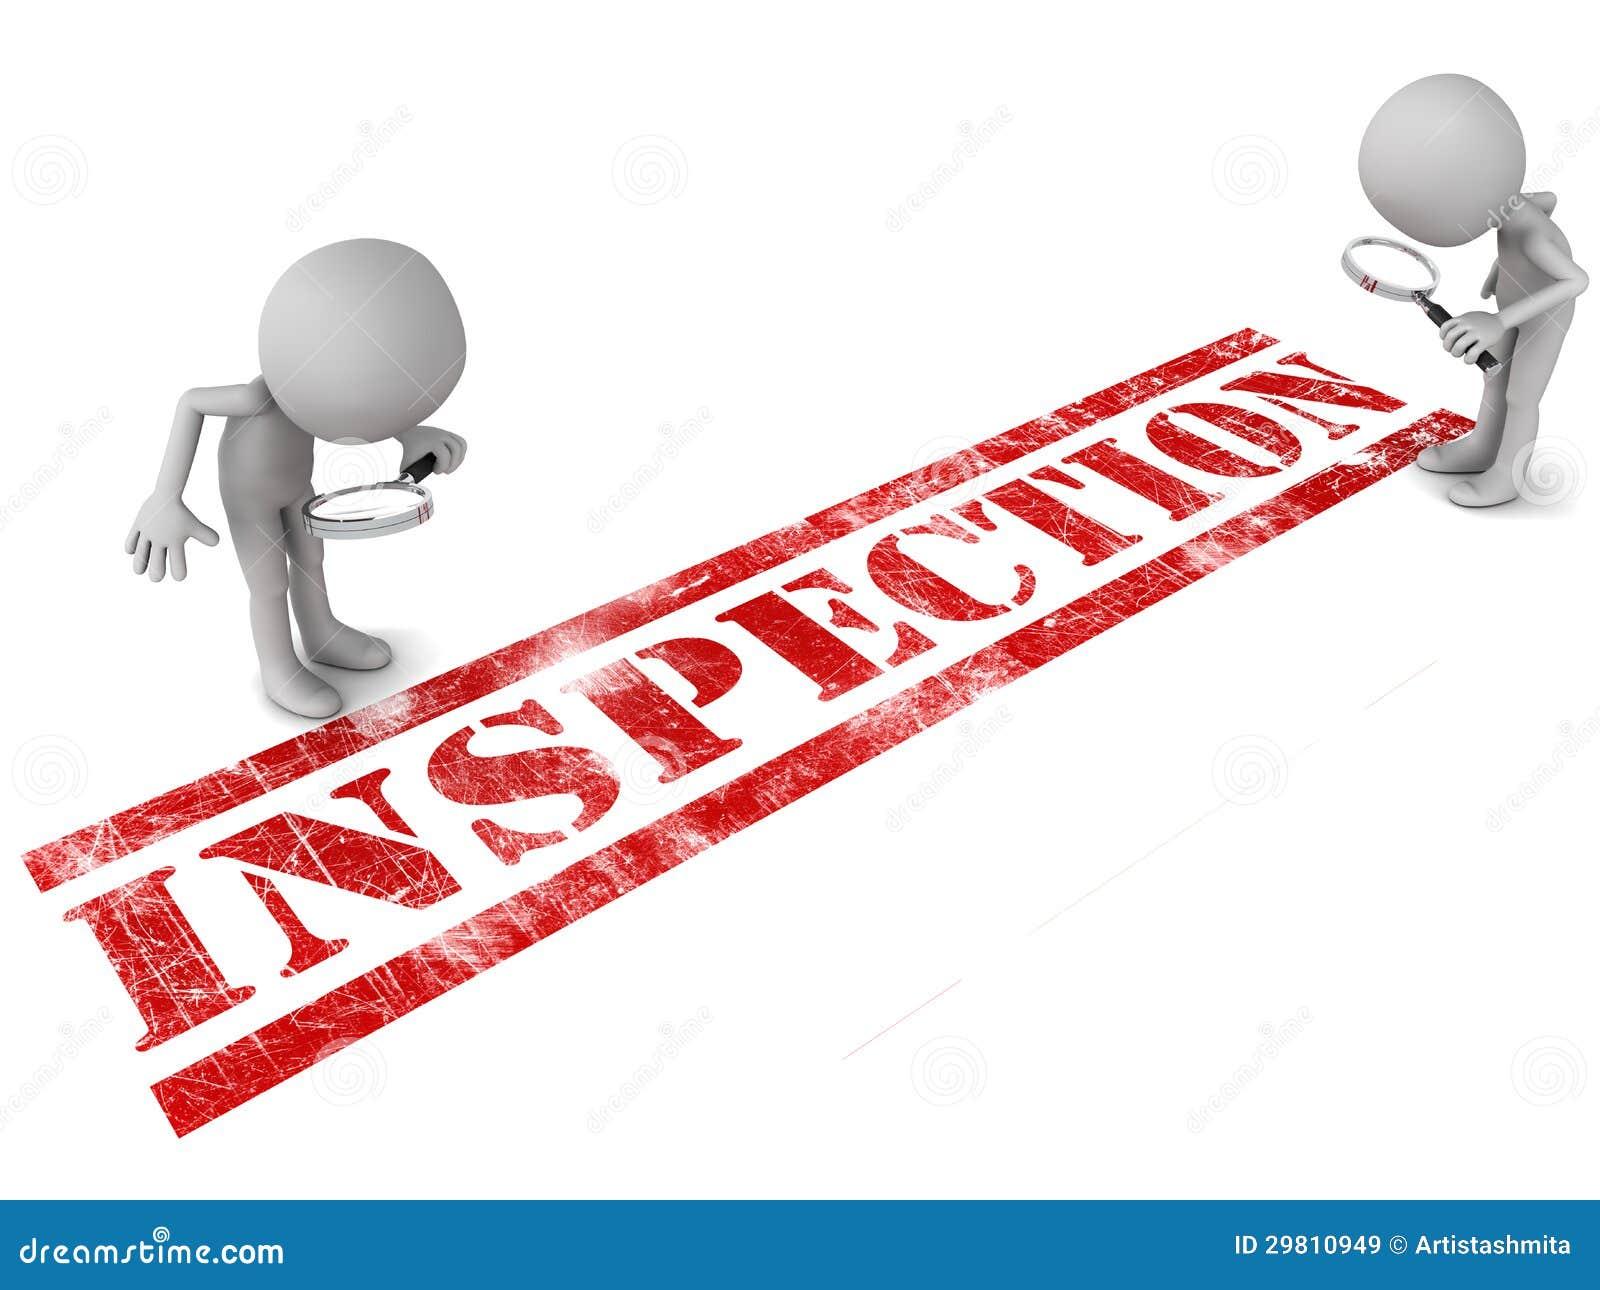 inspection cartoons  illustrations  u0026 vector stock images